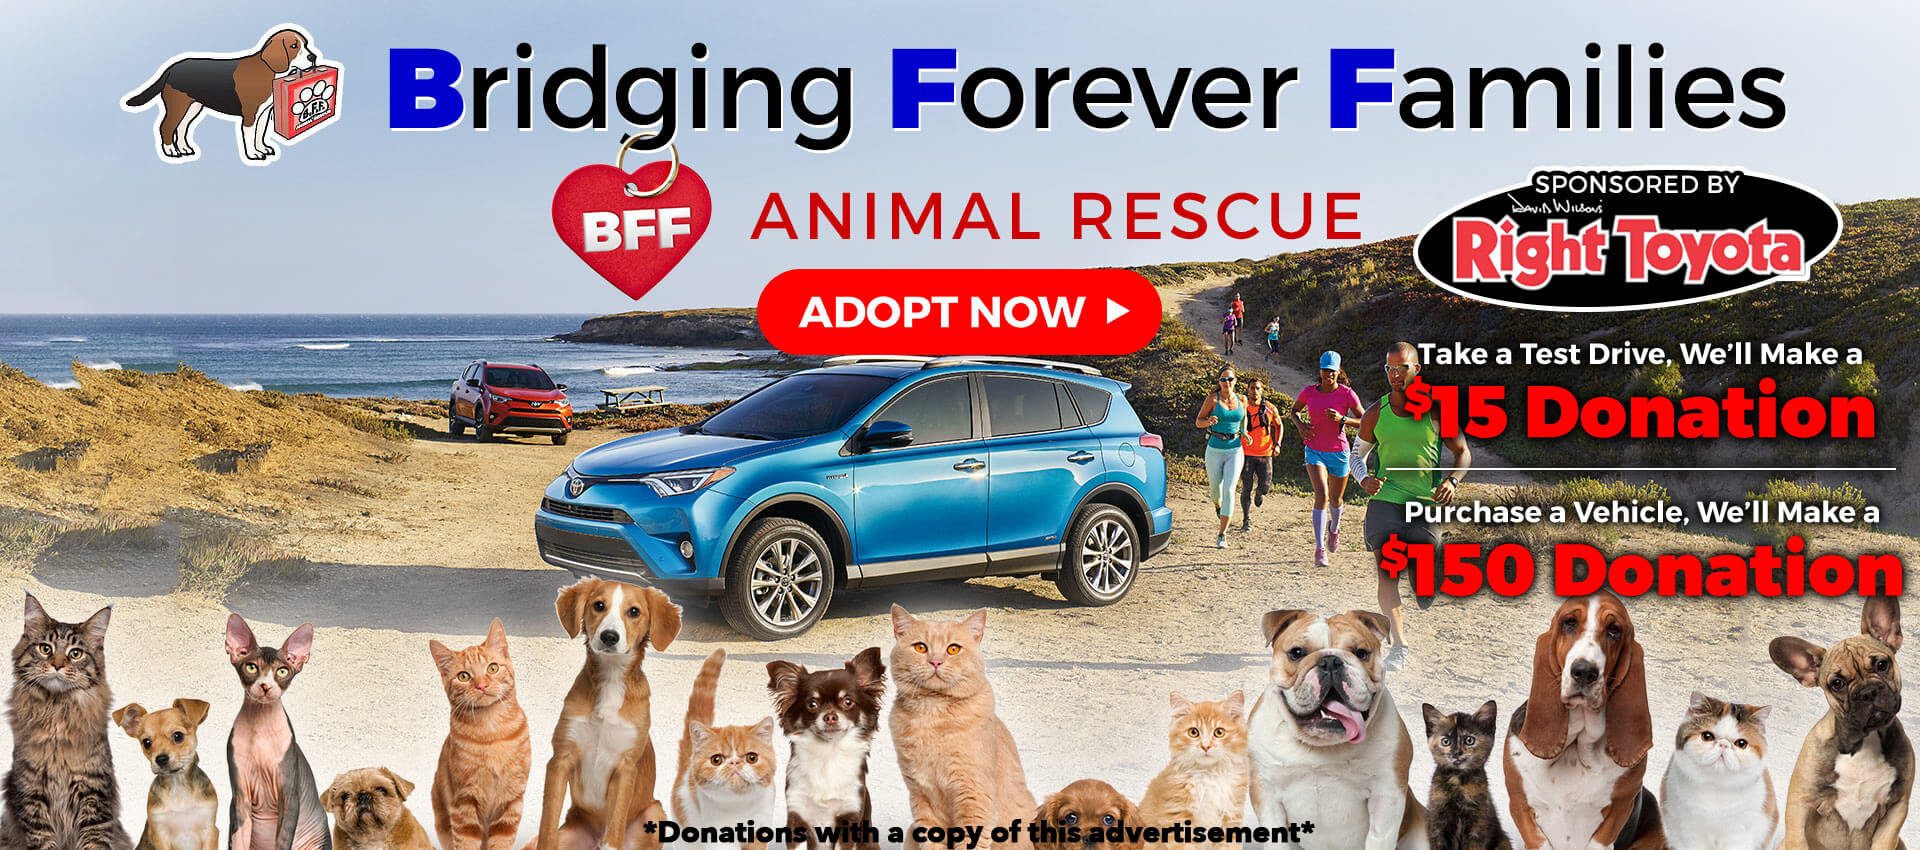 Bridging Forever Families